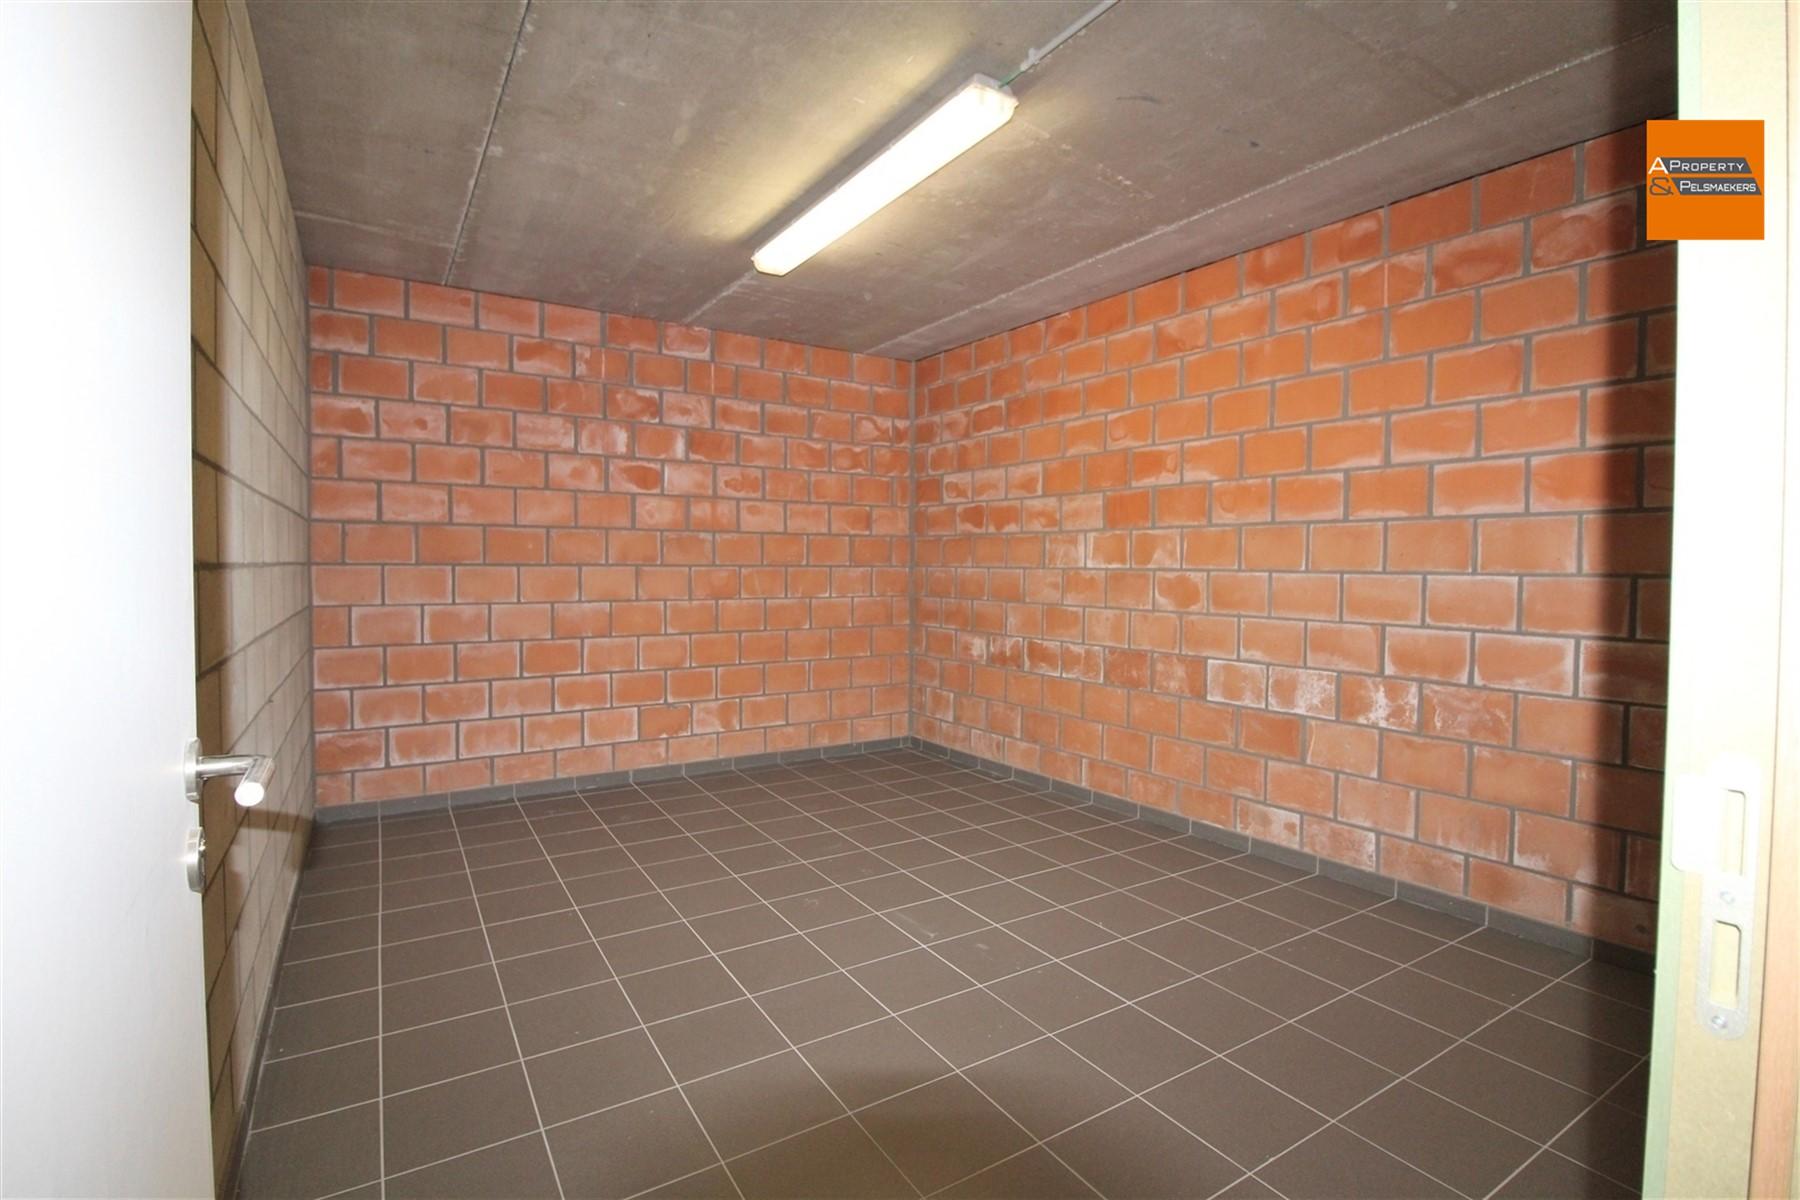 Foto 24 : Duplex/triplex in 3060 BERTEM (België) - Prijs € 319.000